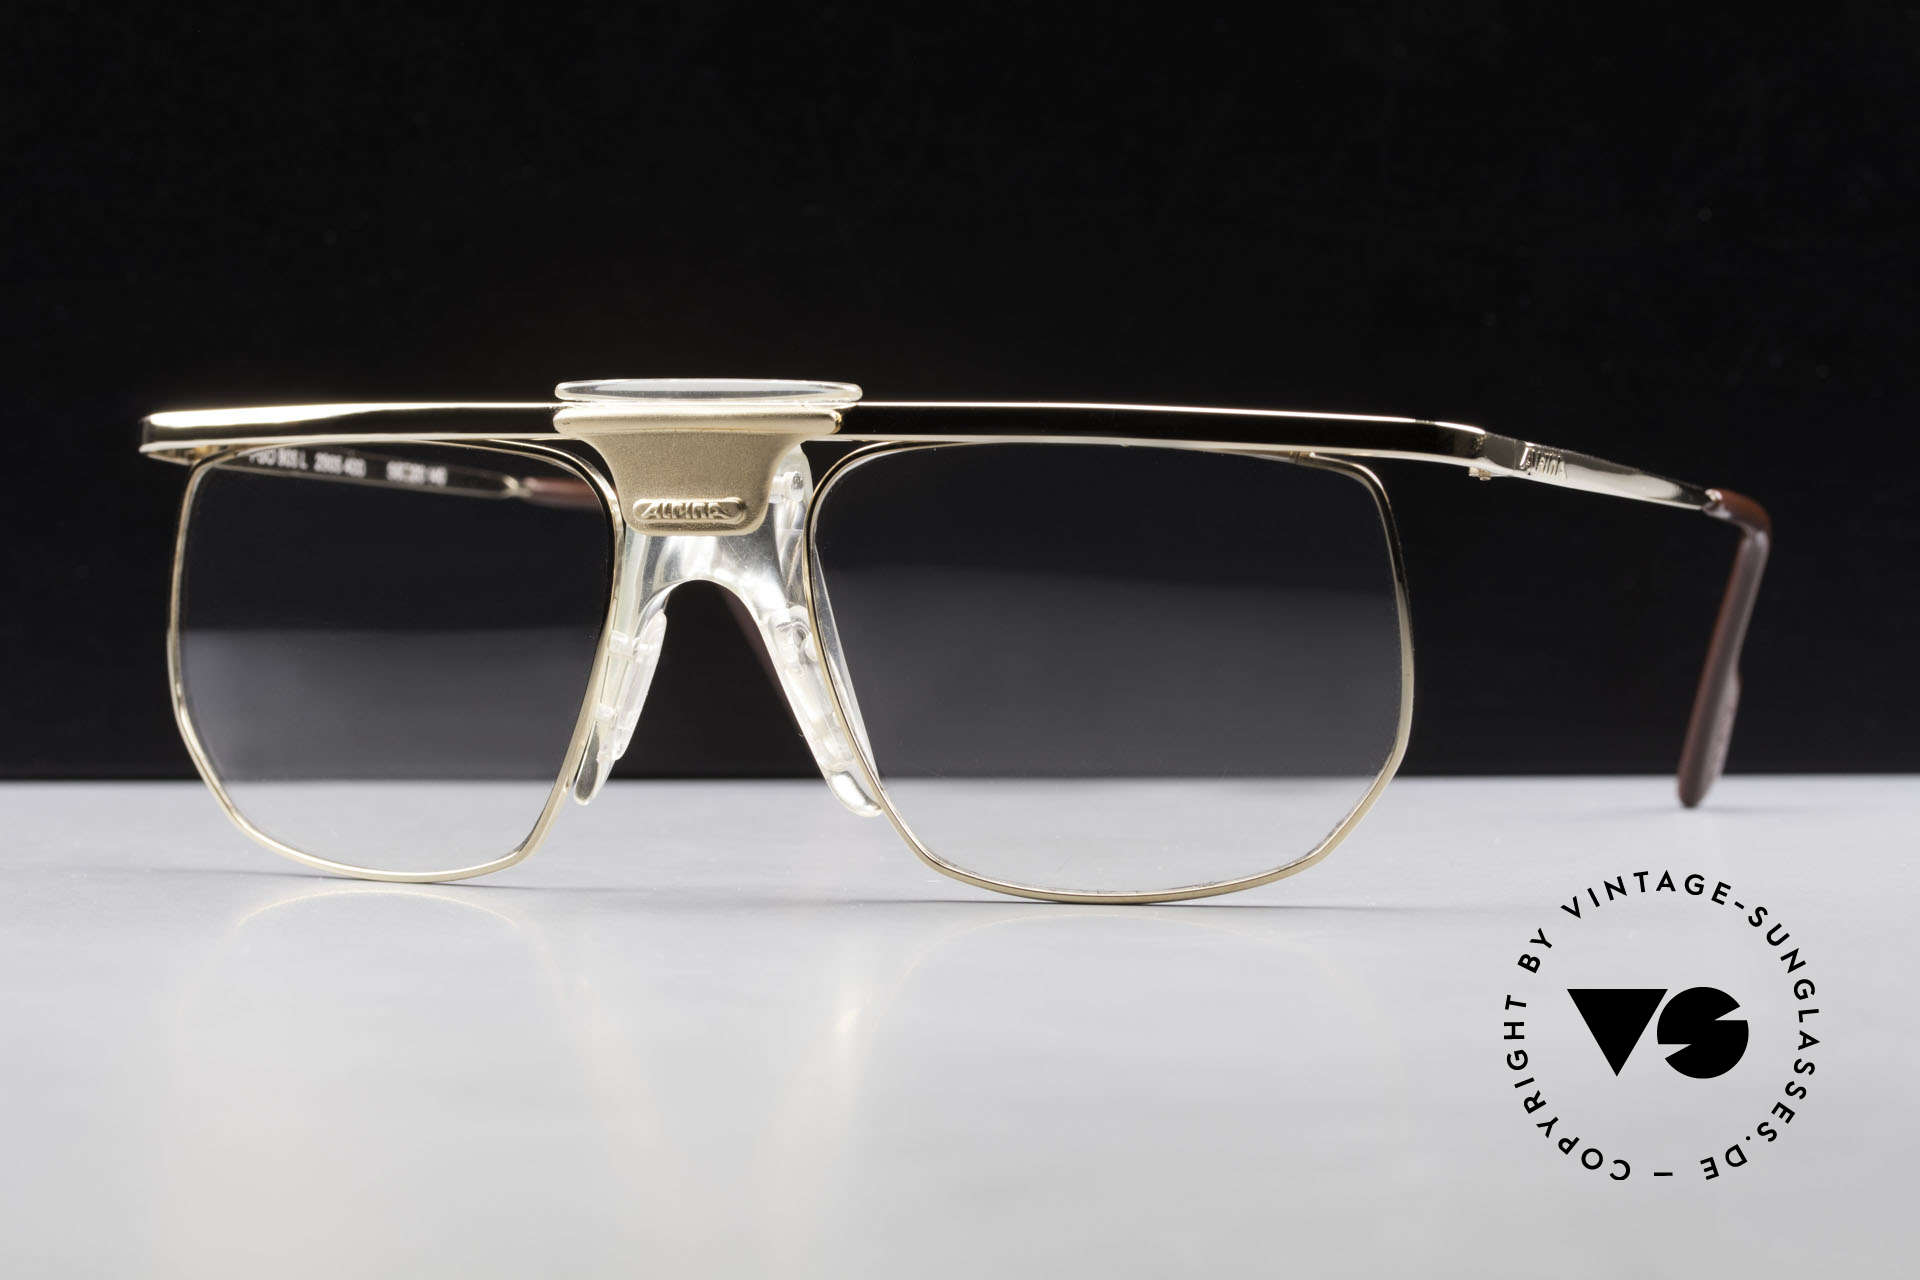 Alpina PSO 905 Vintage Glasses Saddle Bridge, unworn (like all our rare vintage Alpina specs), Made for Men